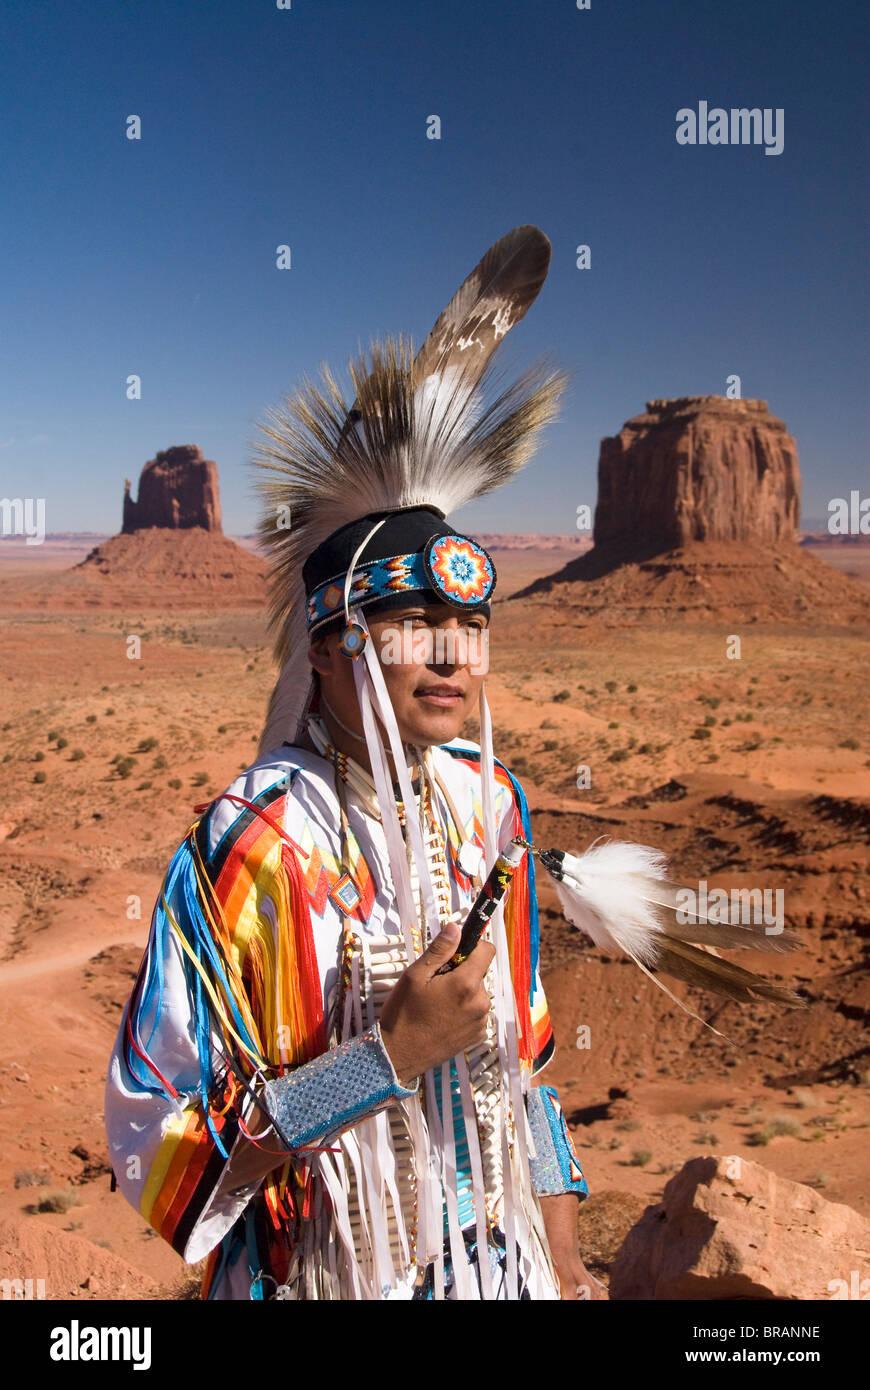 Navajo man in traditional costume, Monument Valley Navajo Tribal Park, Arizona, USA - Stock Image